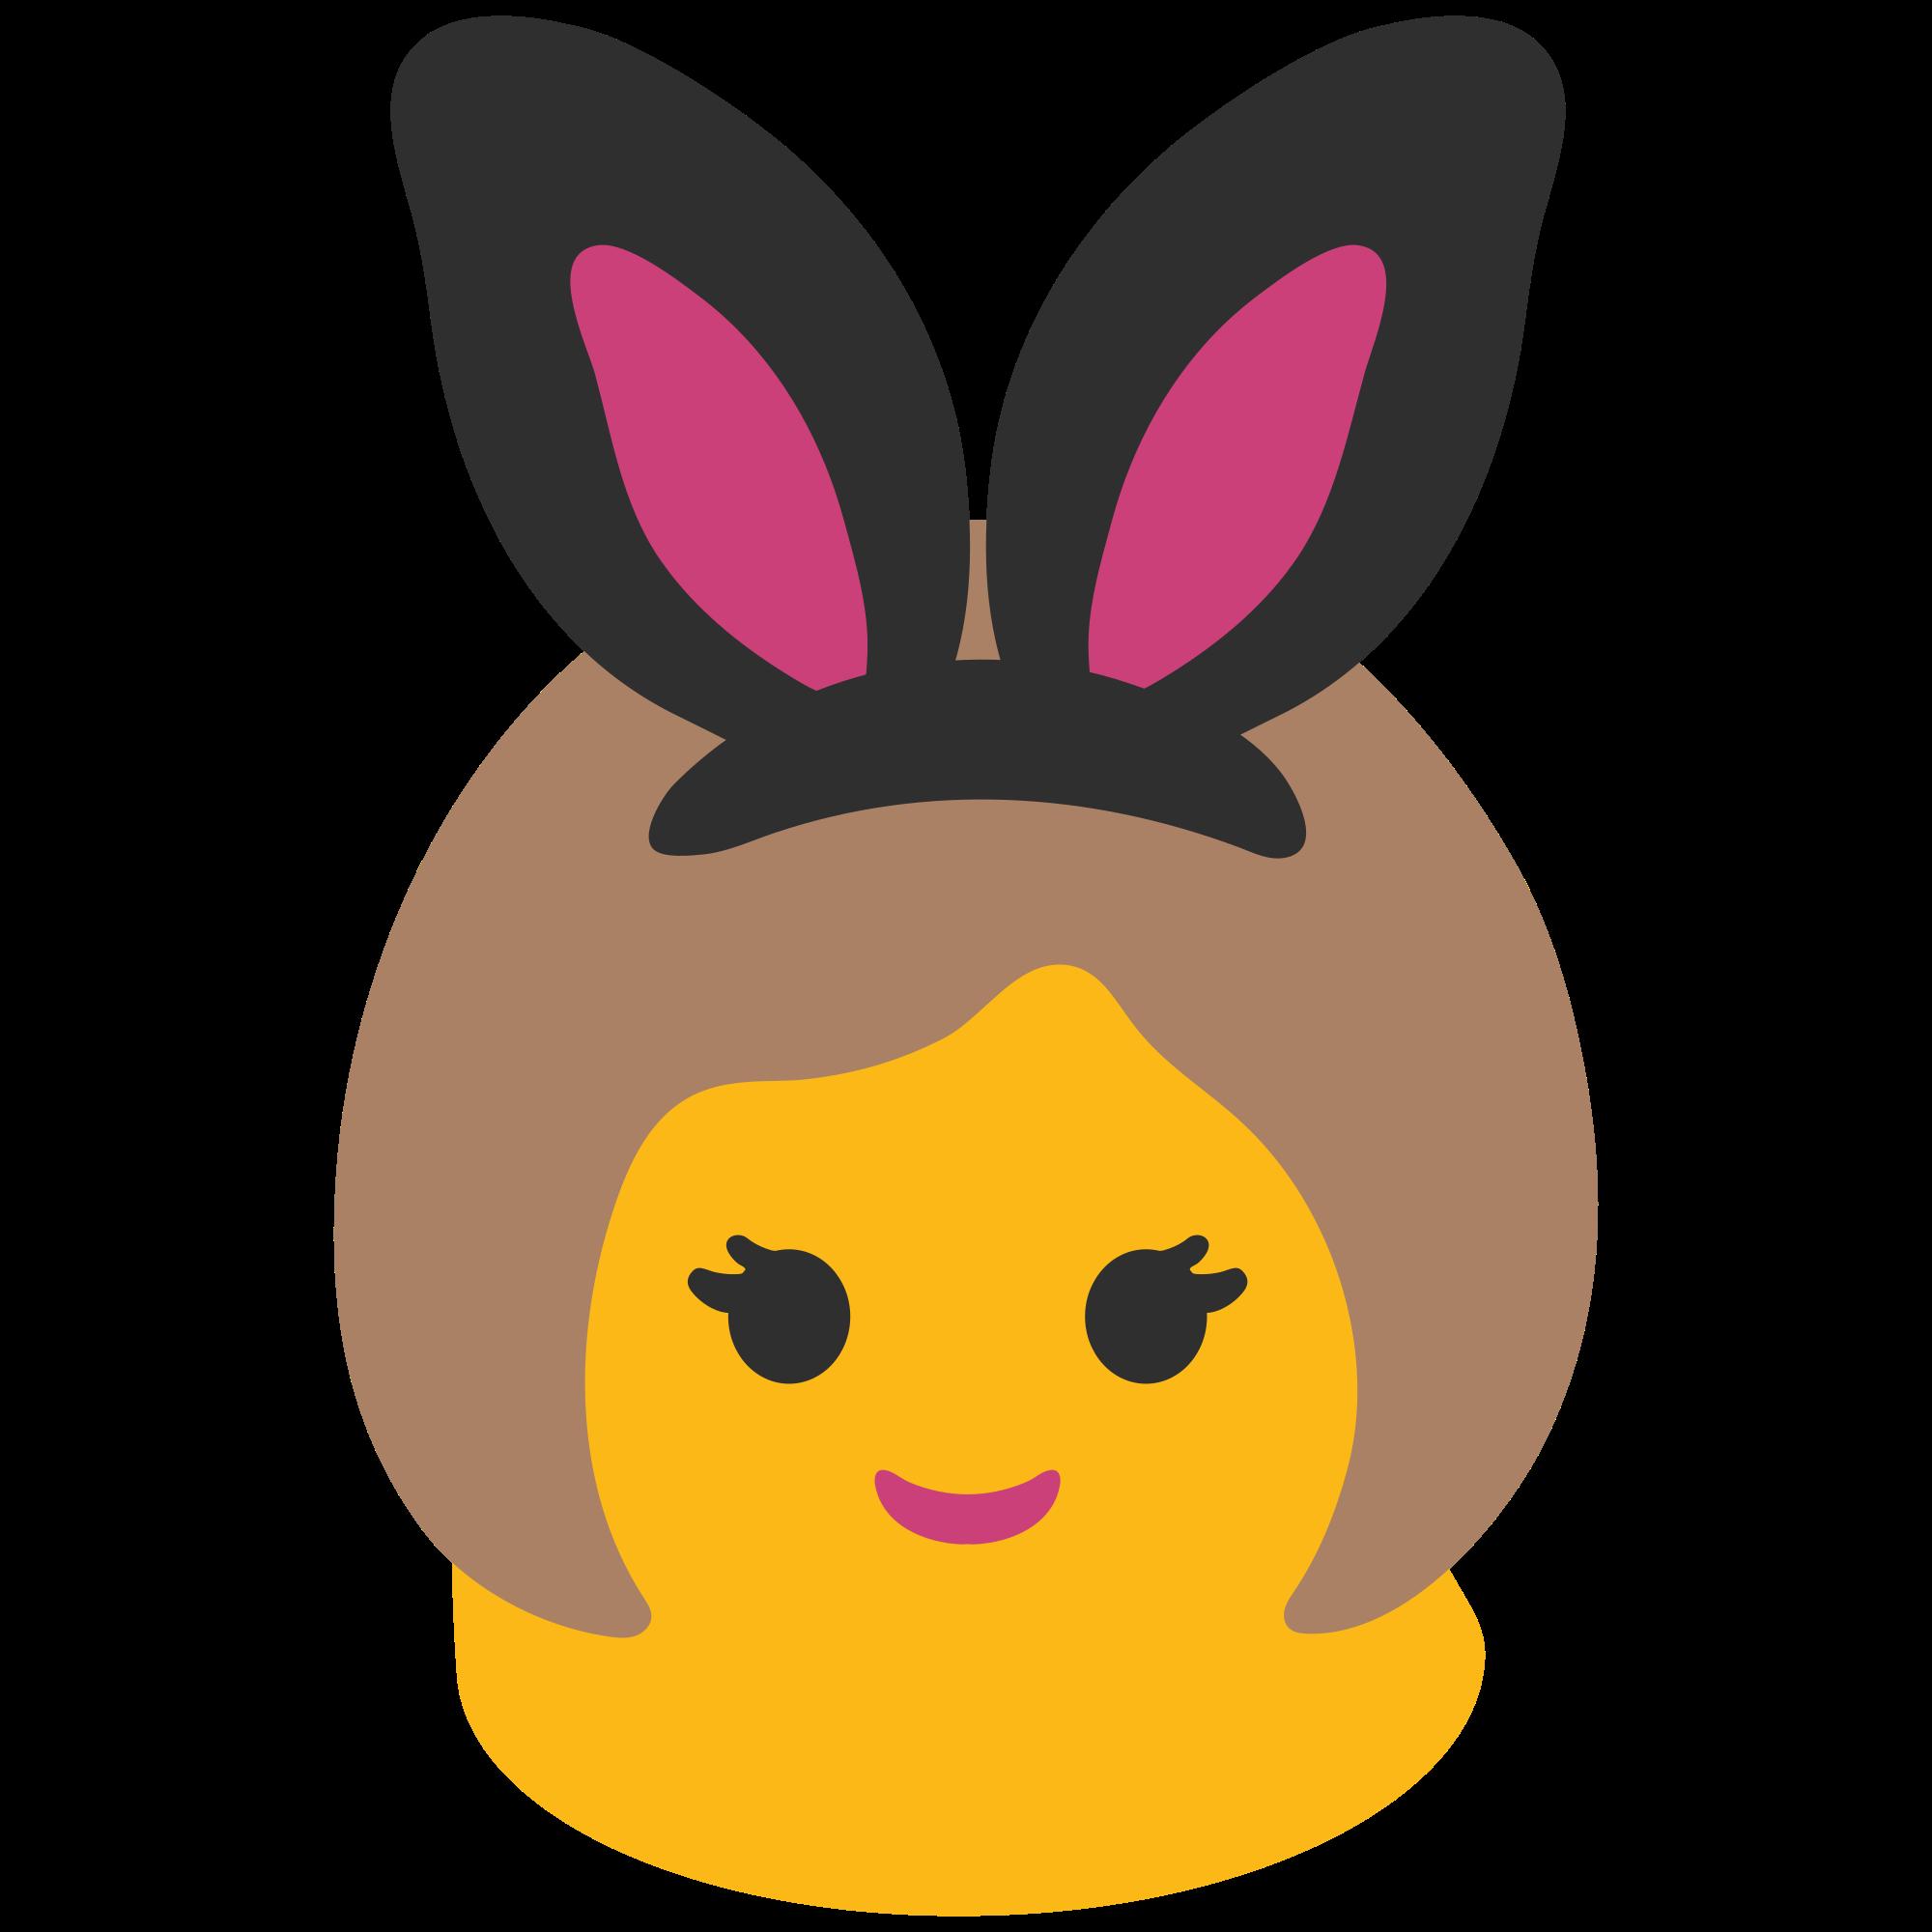 png royalty free download File emoji u f. Vector emojis bunny